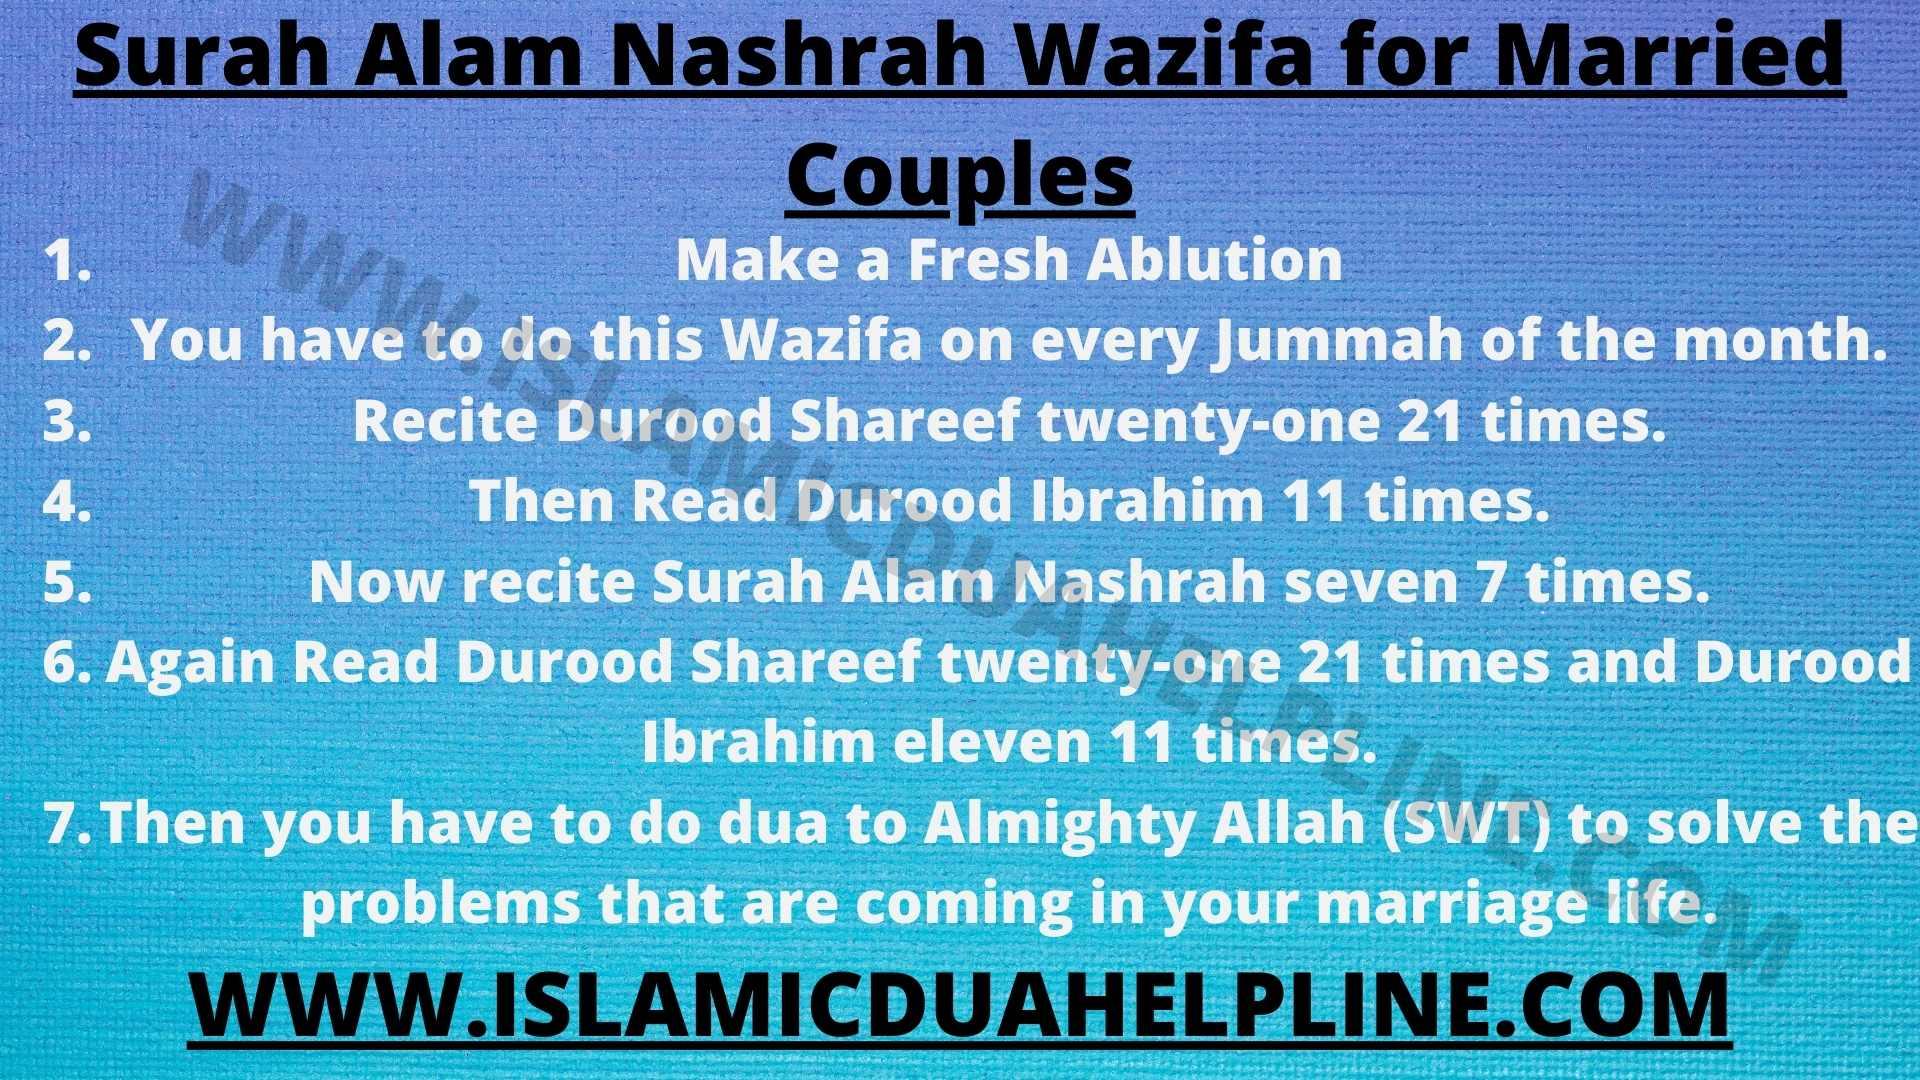 Surah Alam Nashrah Wazifa for Married Couples